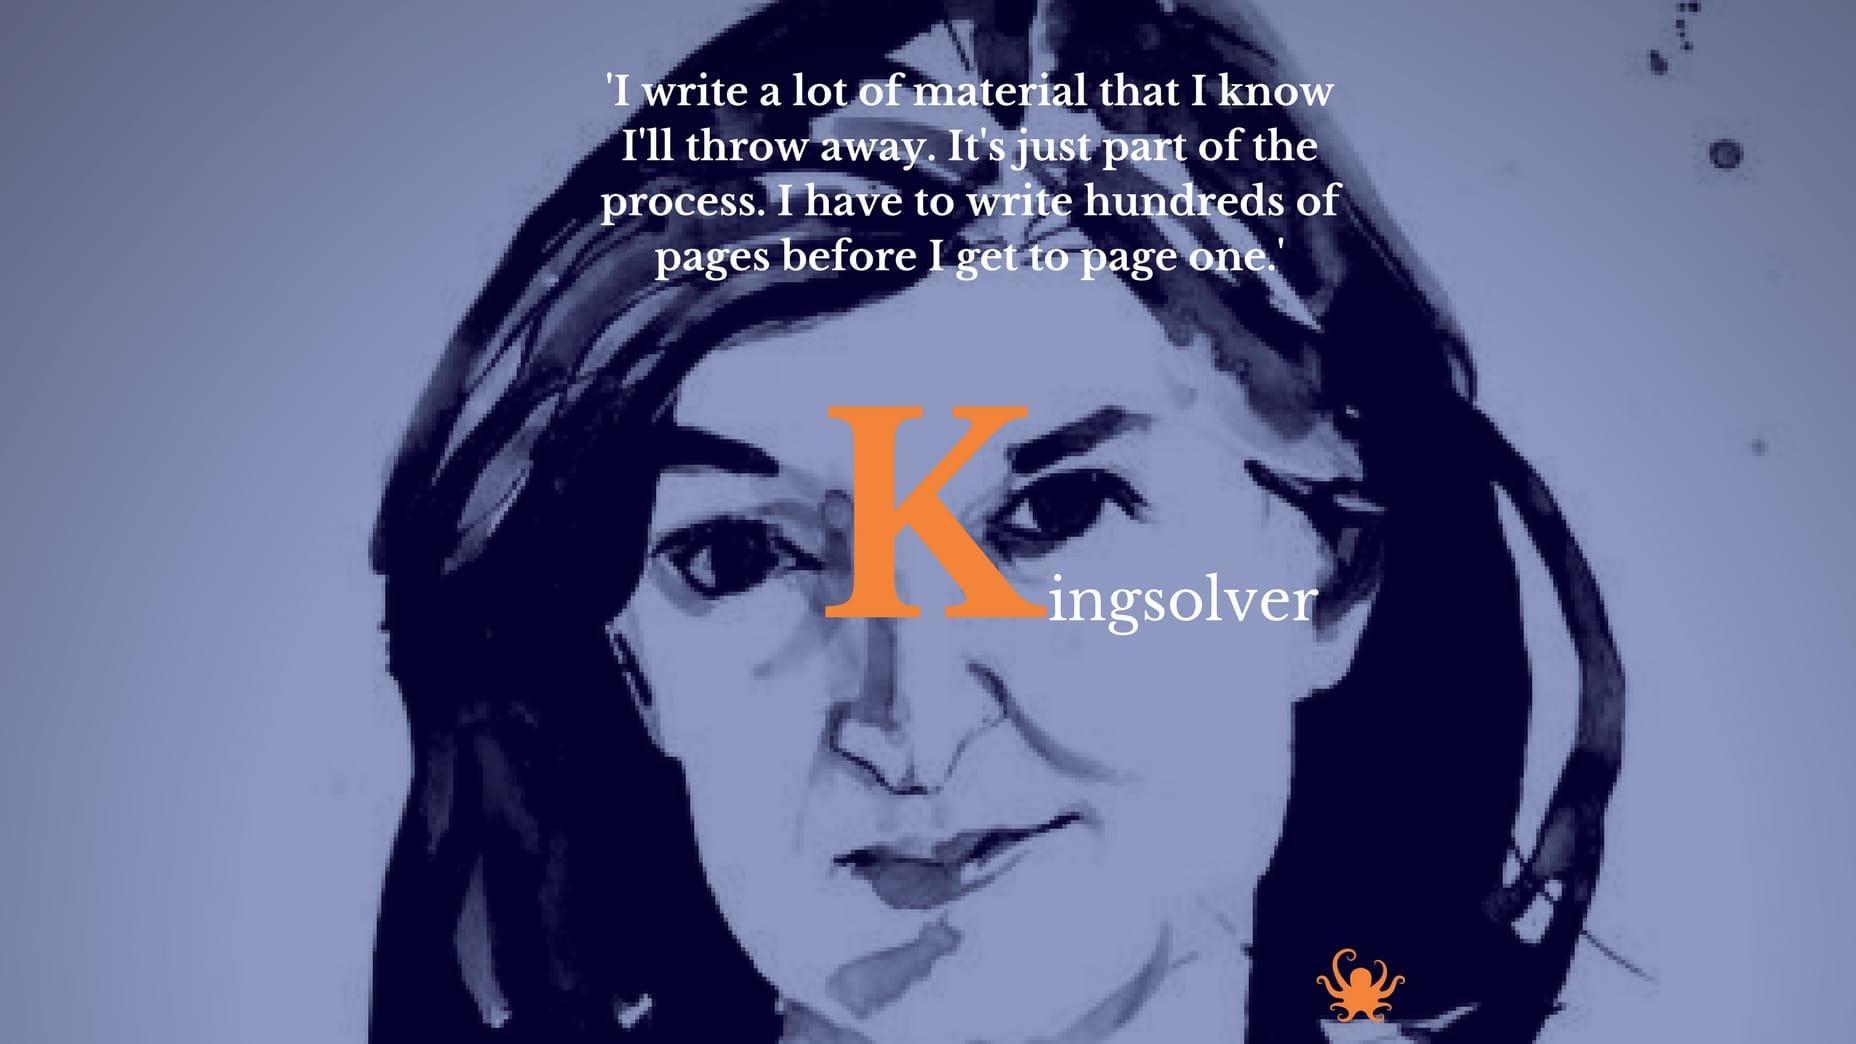 Barbara Kingsolver advice